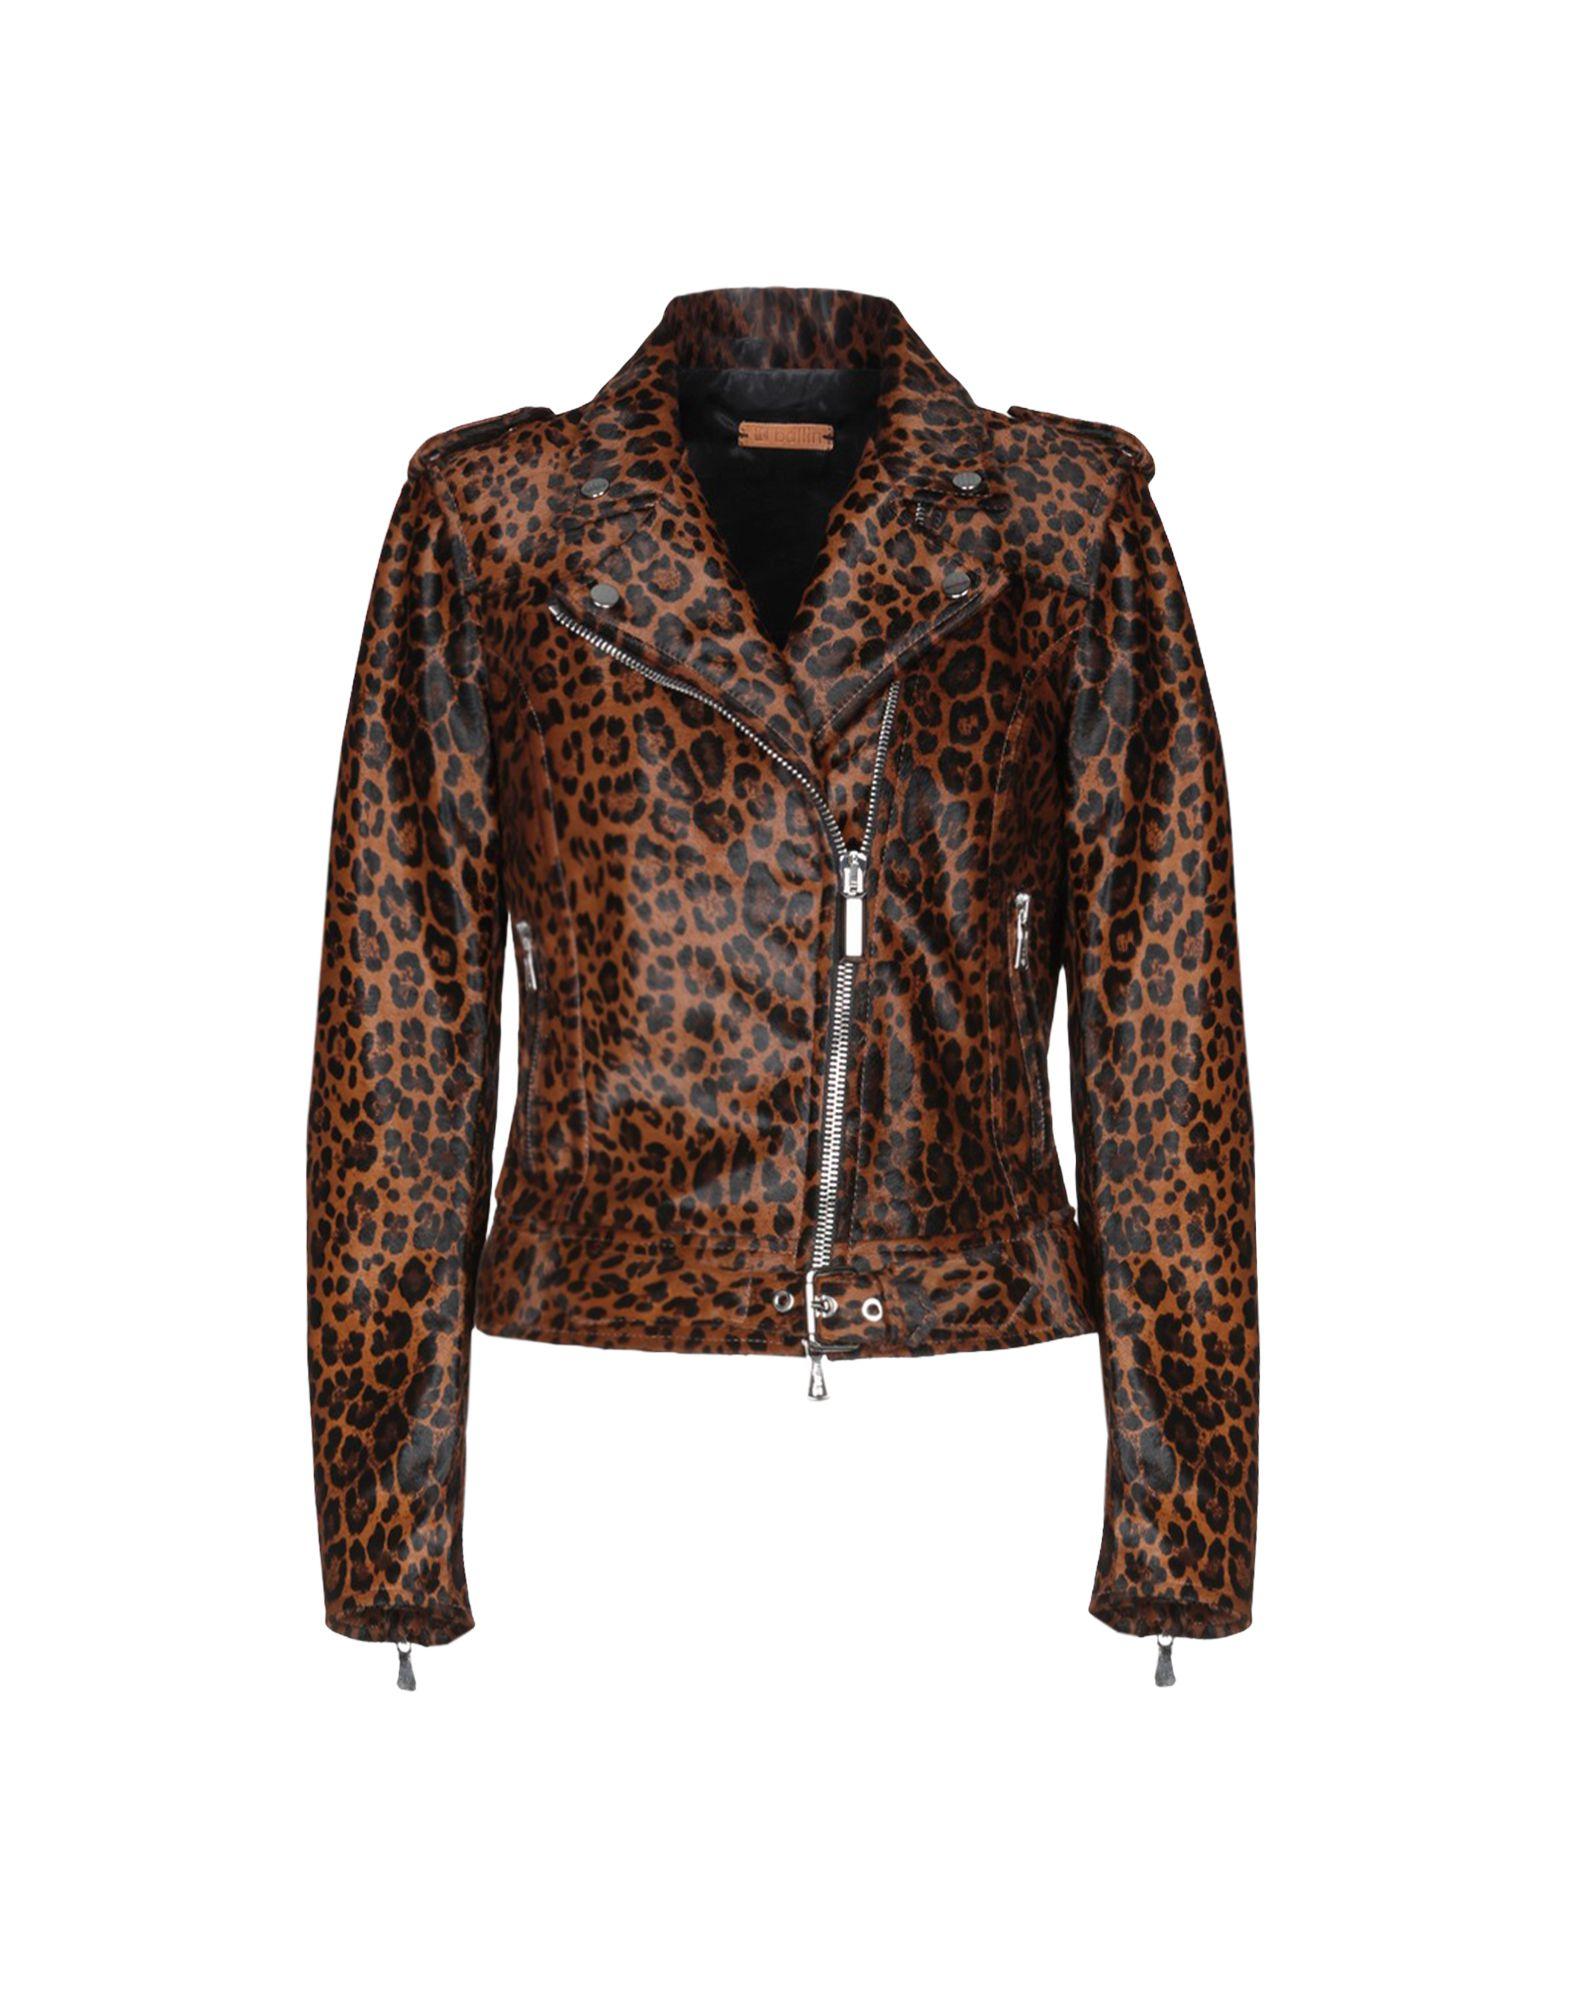 99a75c8a29 Ballin Biker Jacket - Women Ballin Biker Jackets online on YOOX ...